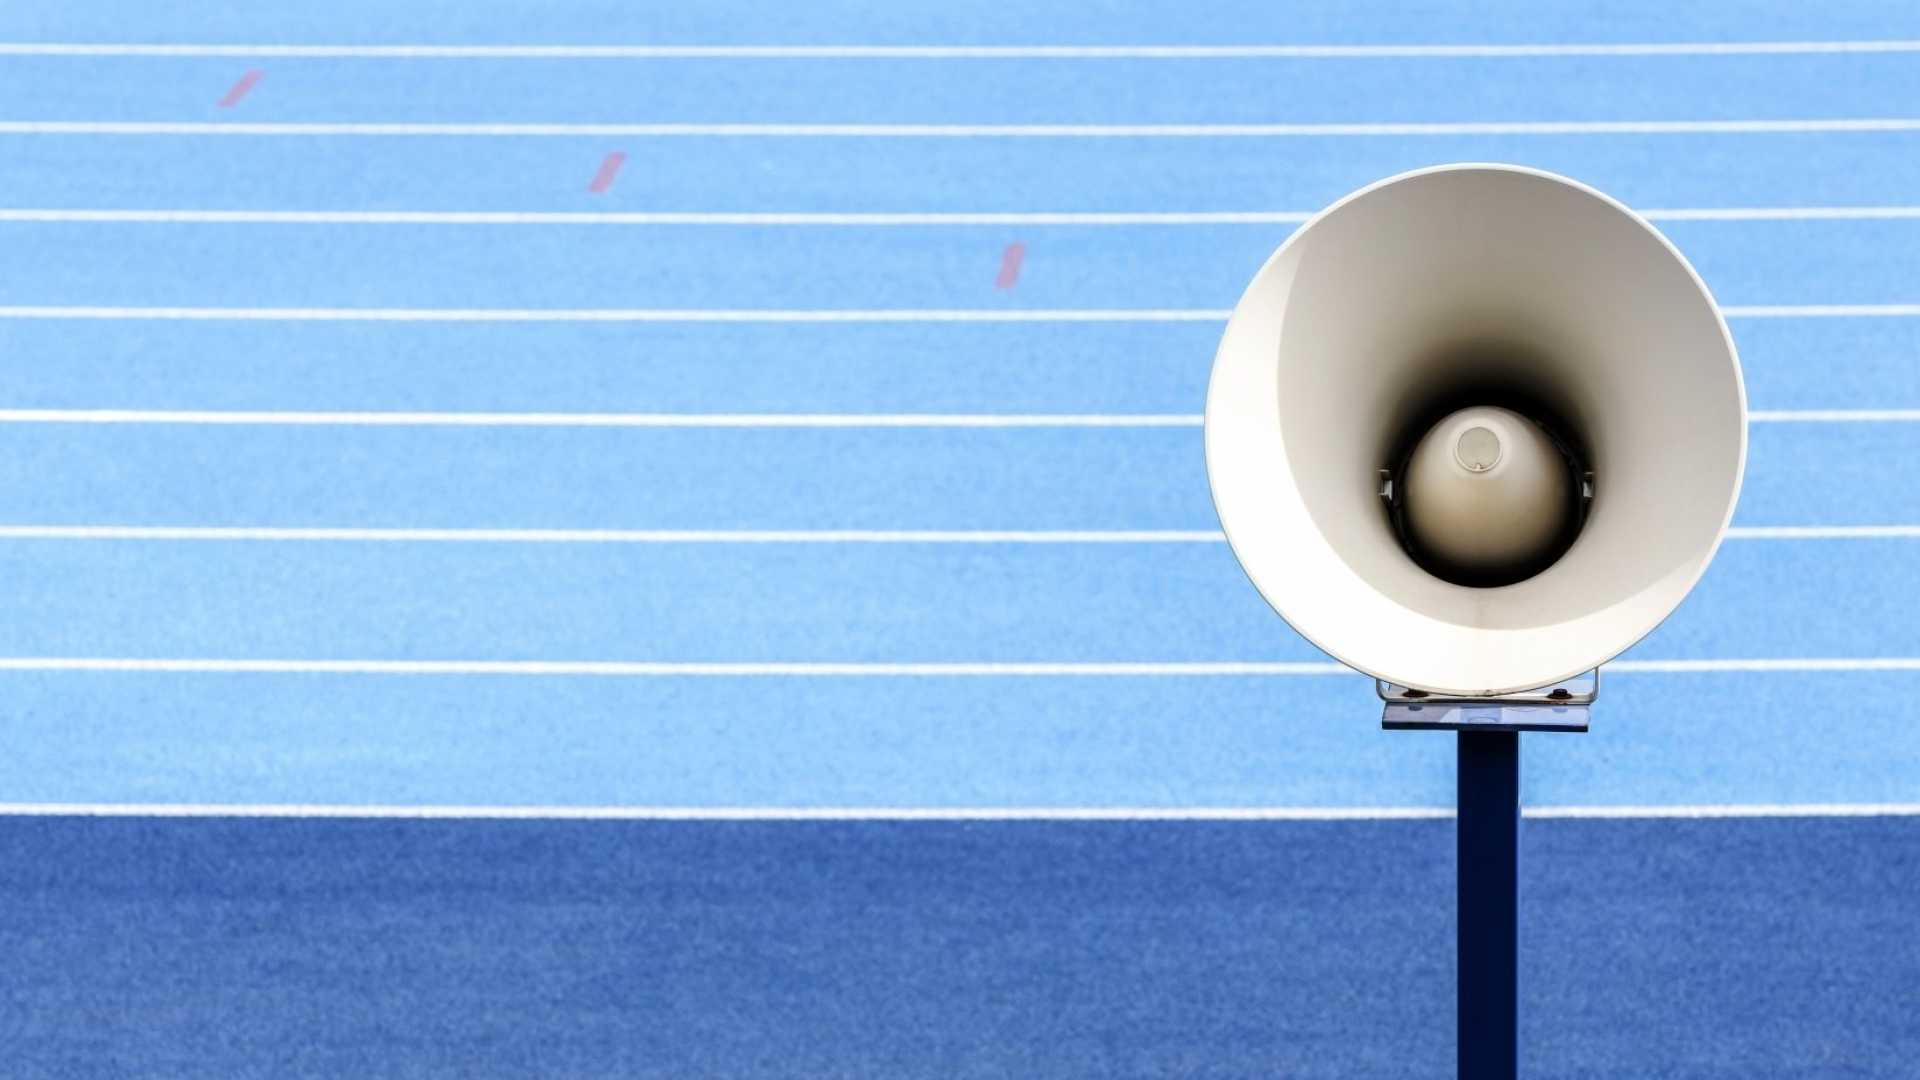 20 Things Successful Entrepreneurs Never Say